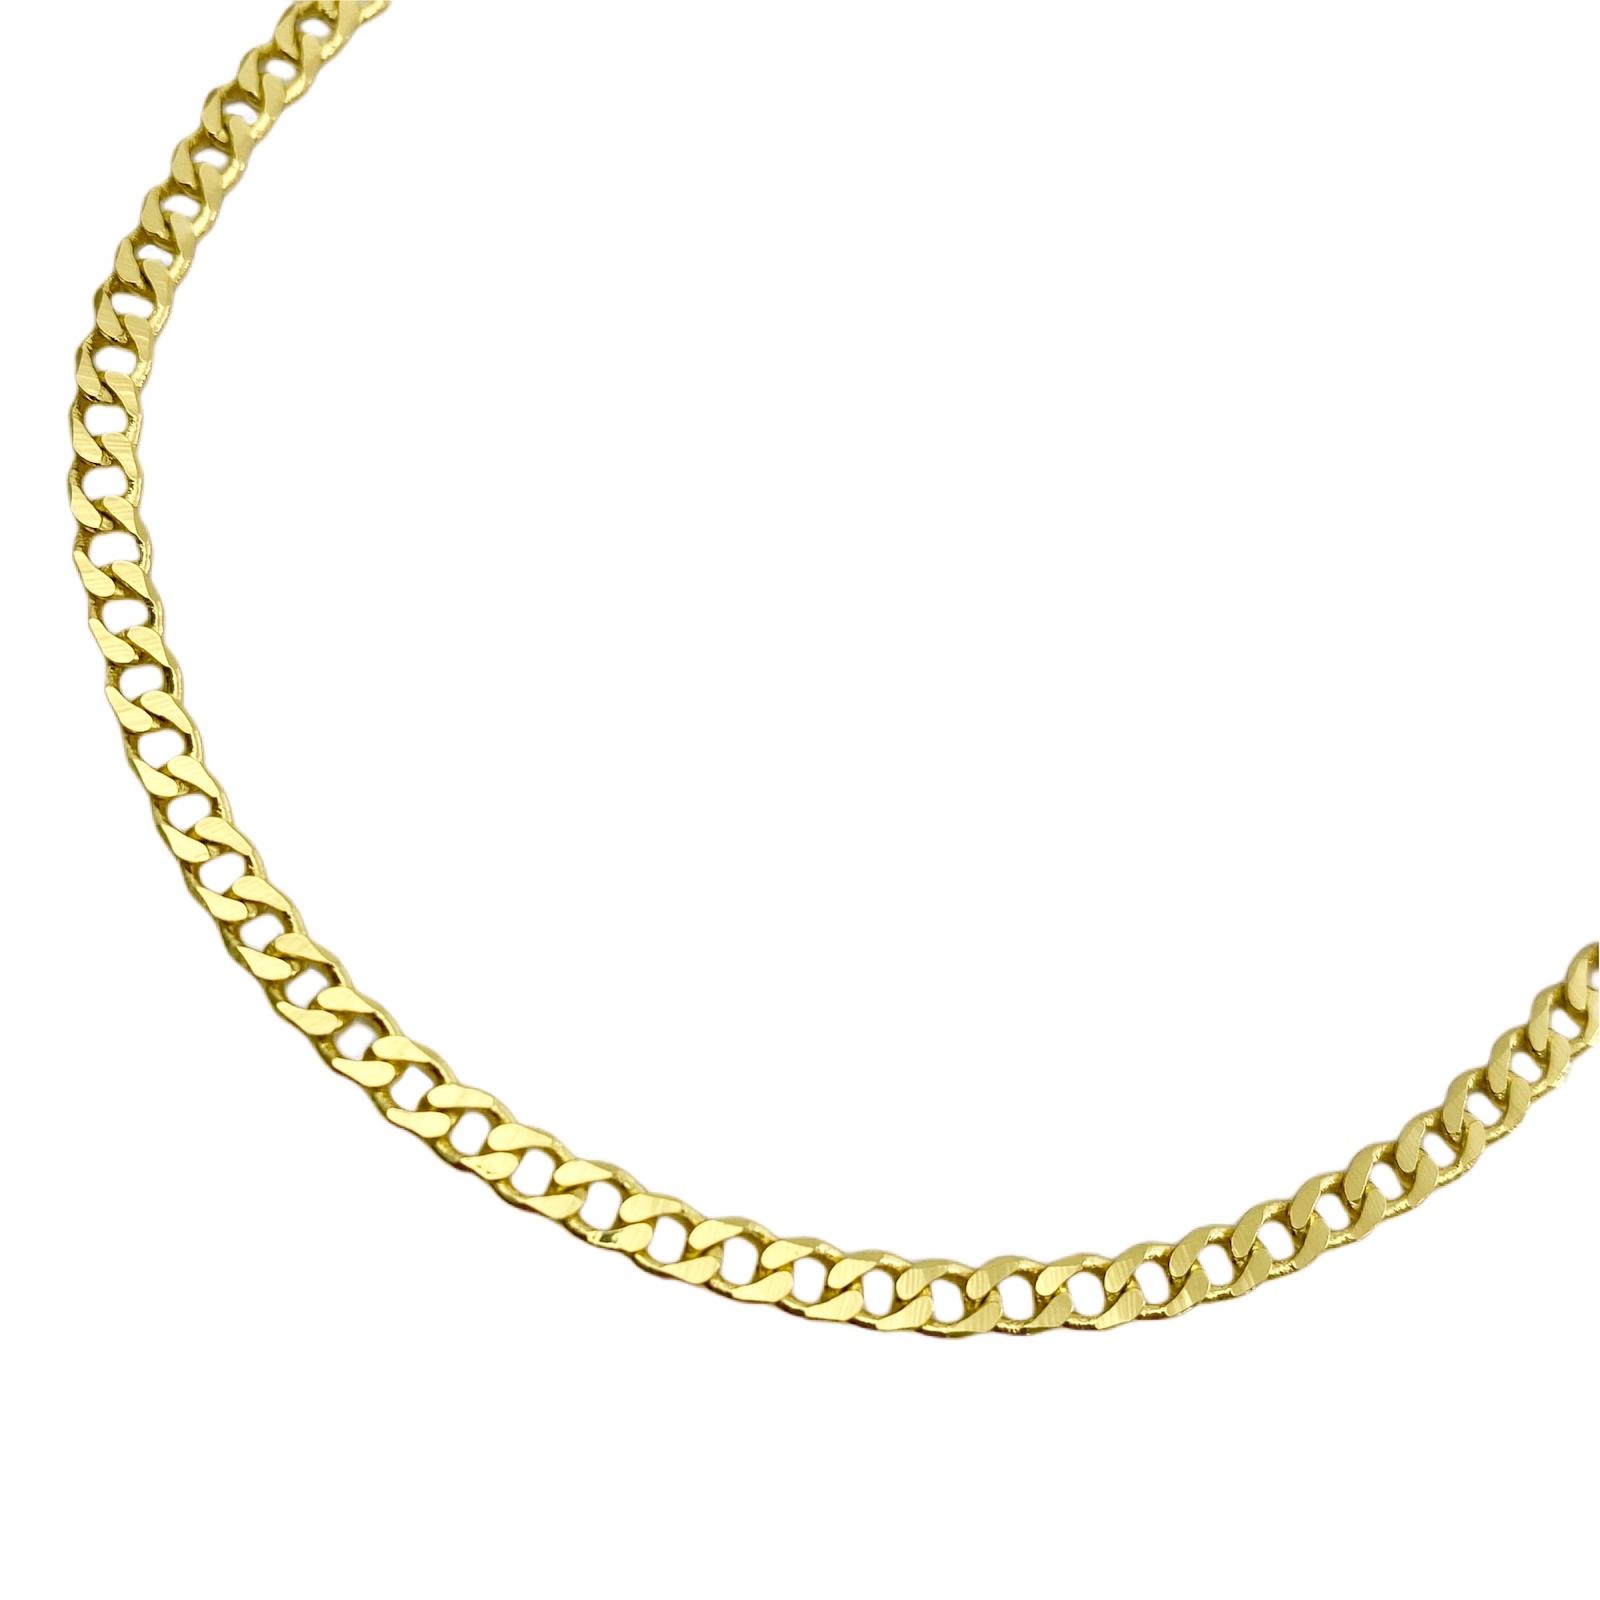 Corrente Grumet 3,2mm 70cm 11,5g (Fecho Gaveta) (Banho Ouro 24k)